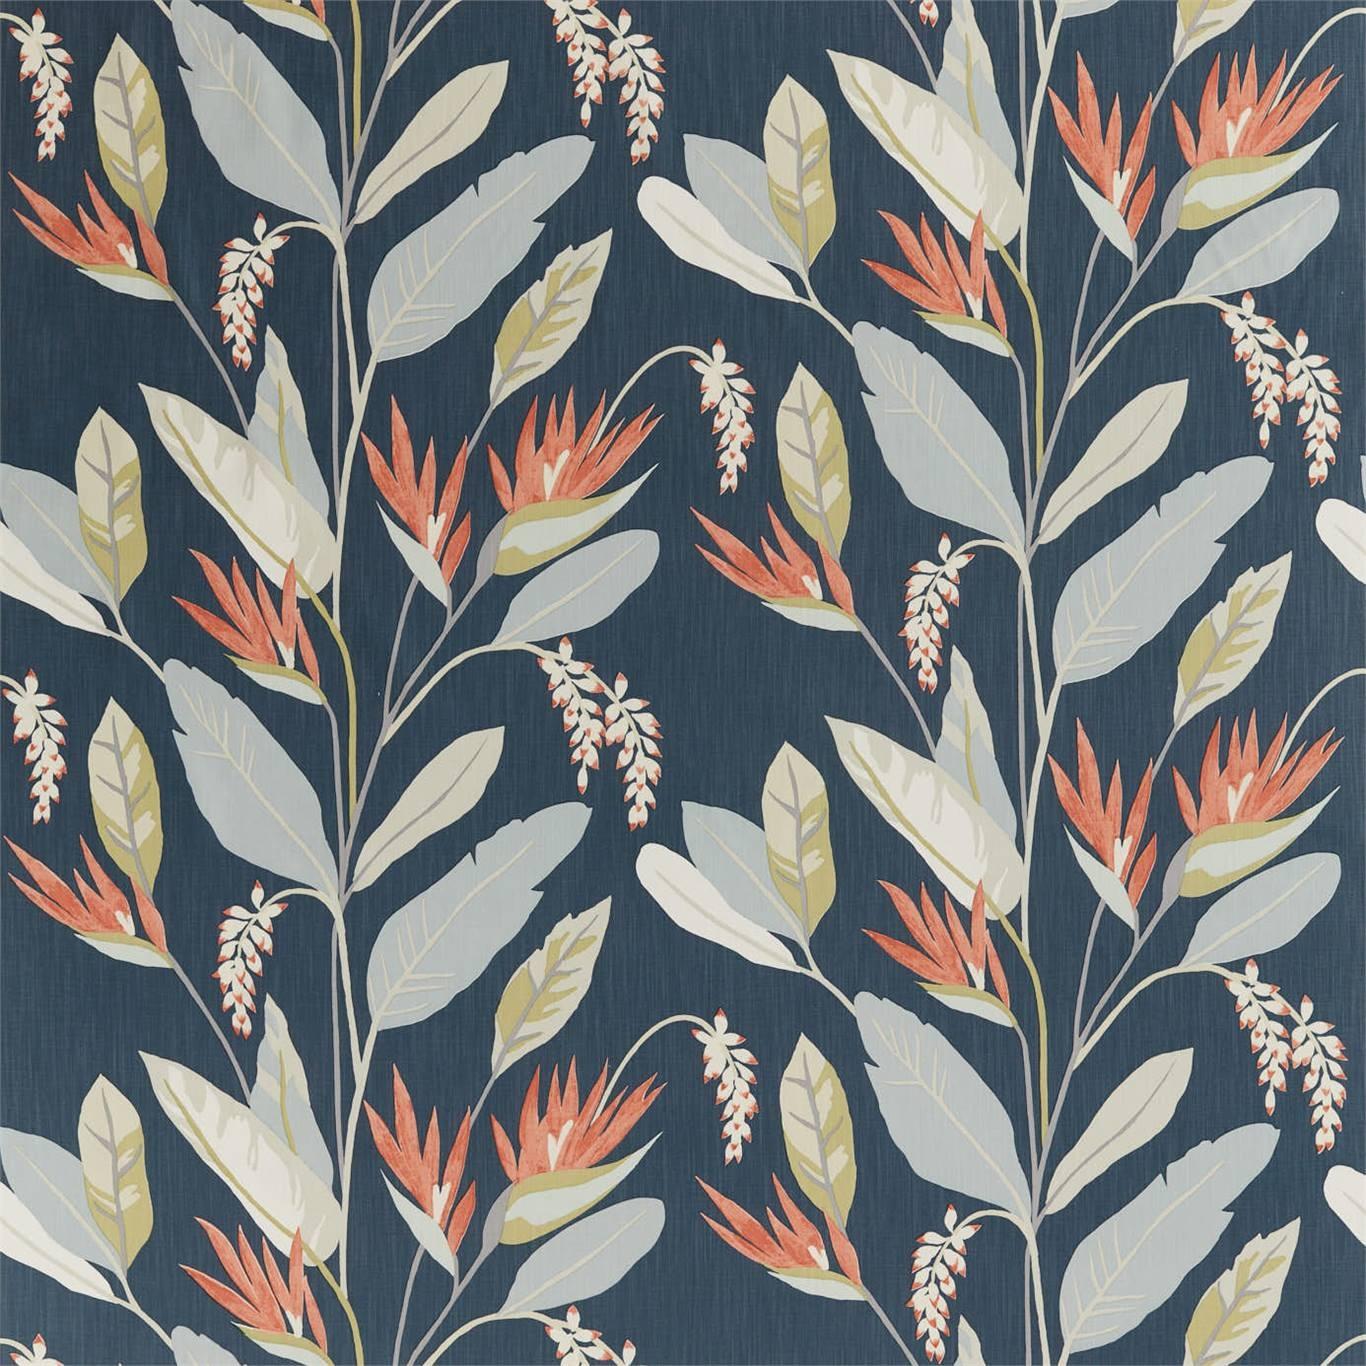 Image of Harlequin Llenya Ink/Coral/Pebble Curtain Fabric 120909